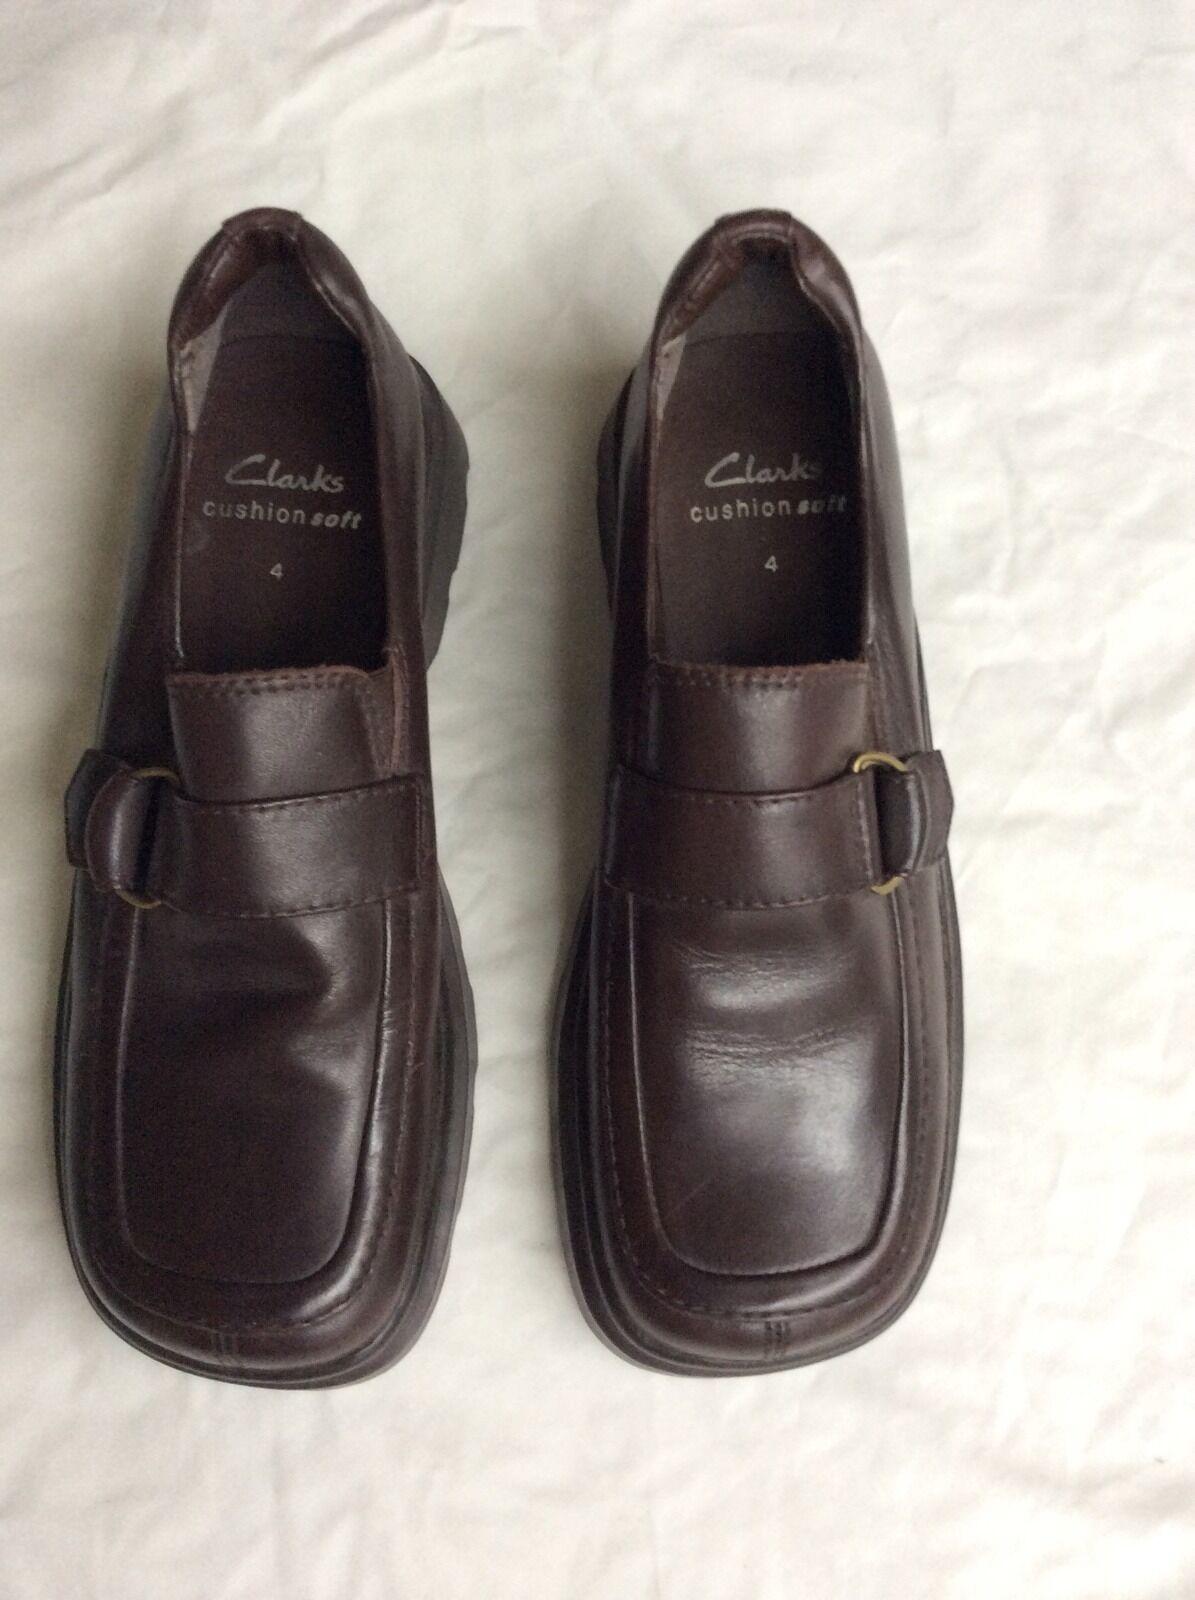 NWOB Ladies Clarks shoes cushion soft loafers UK4